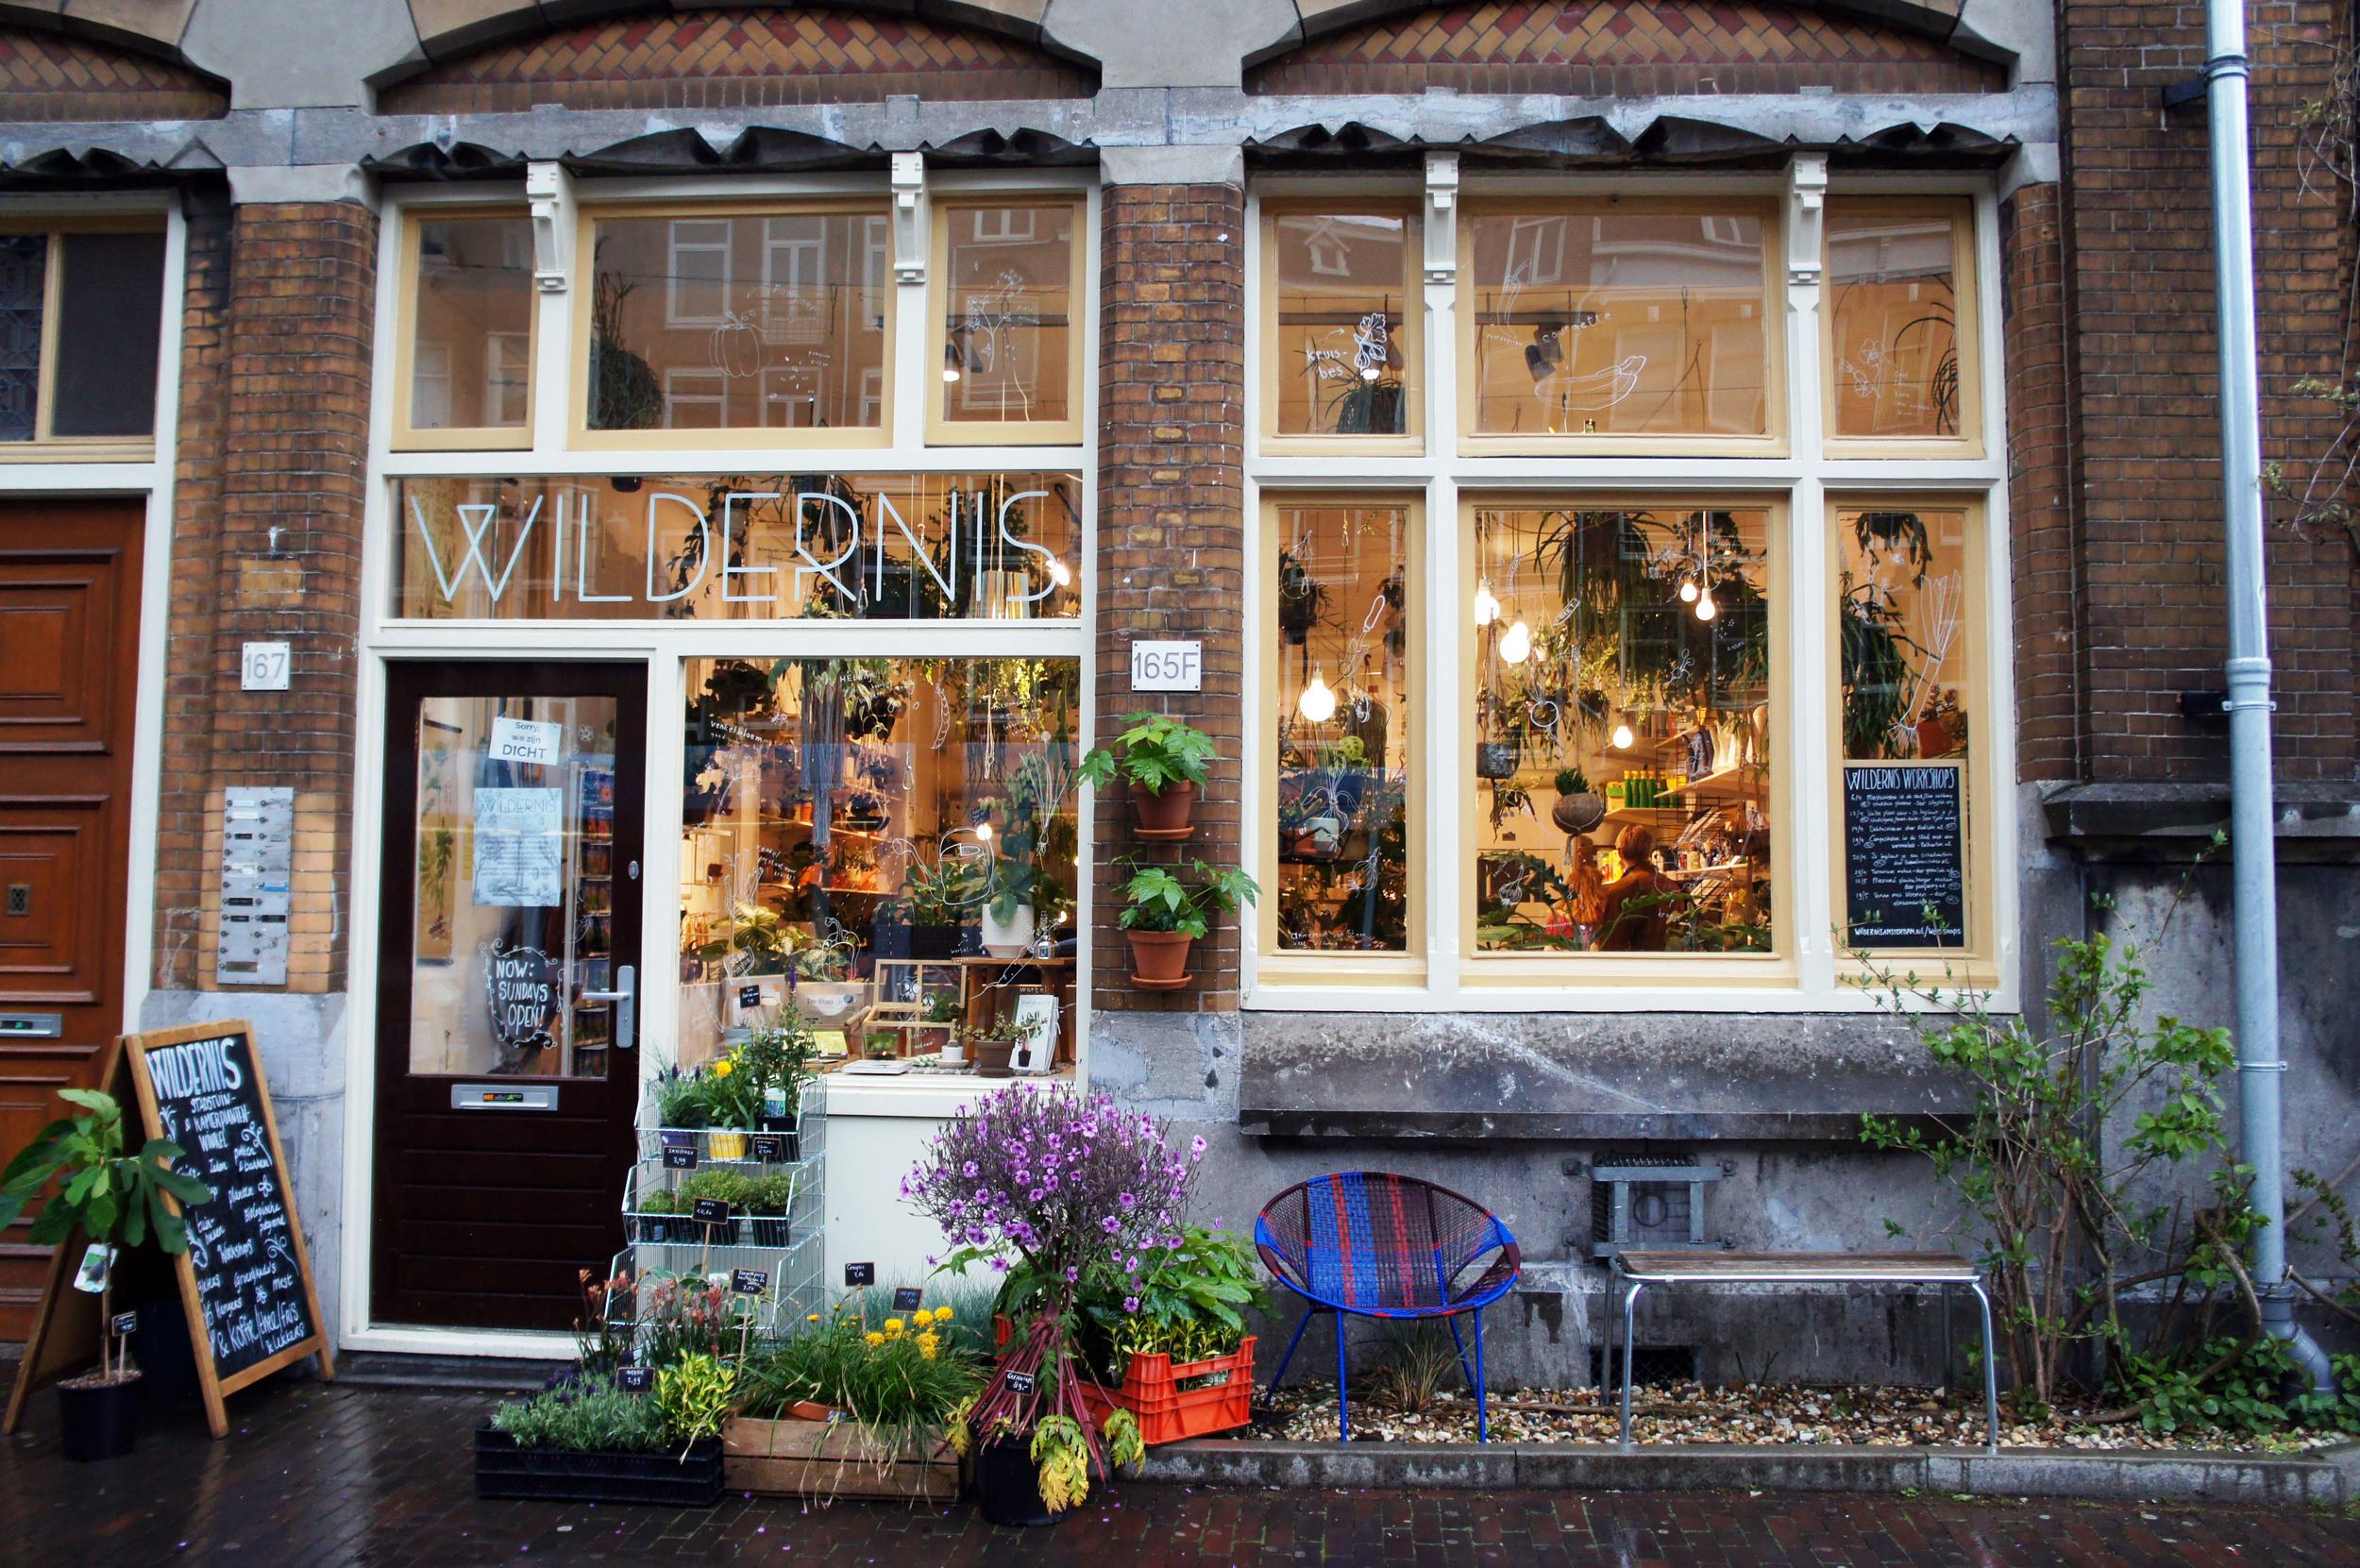 Wildernis plant shop in Amsterdam